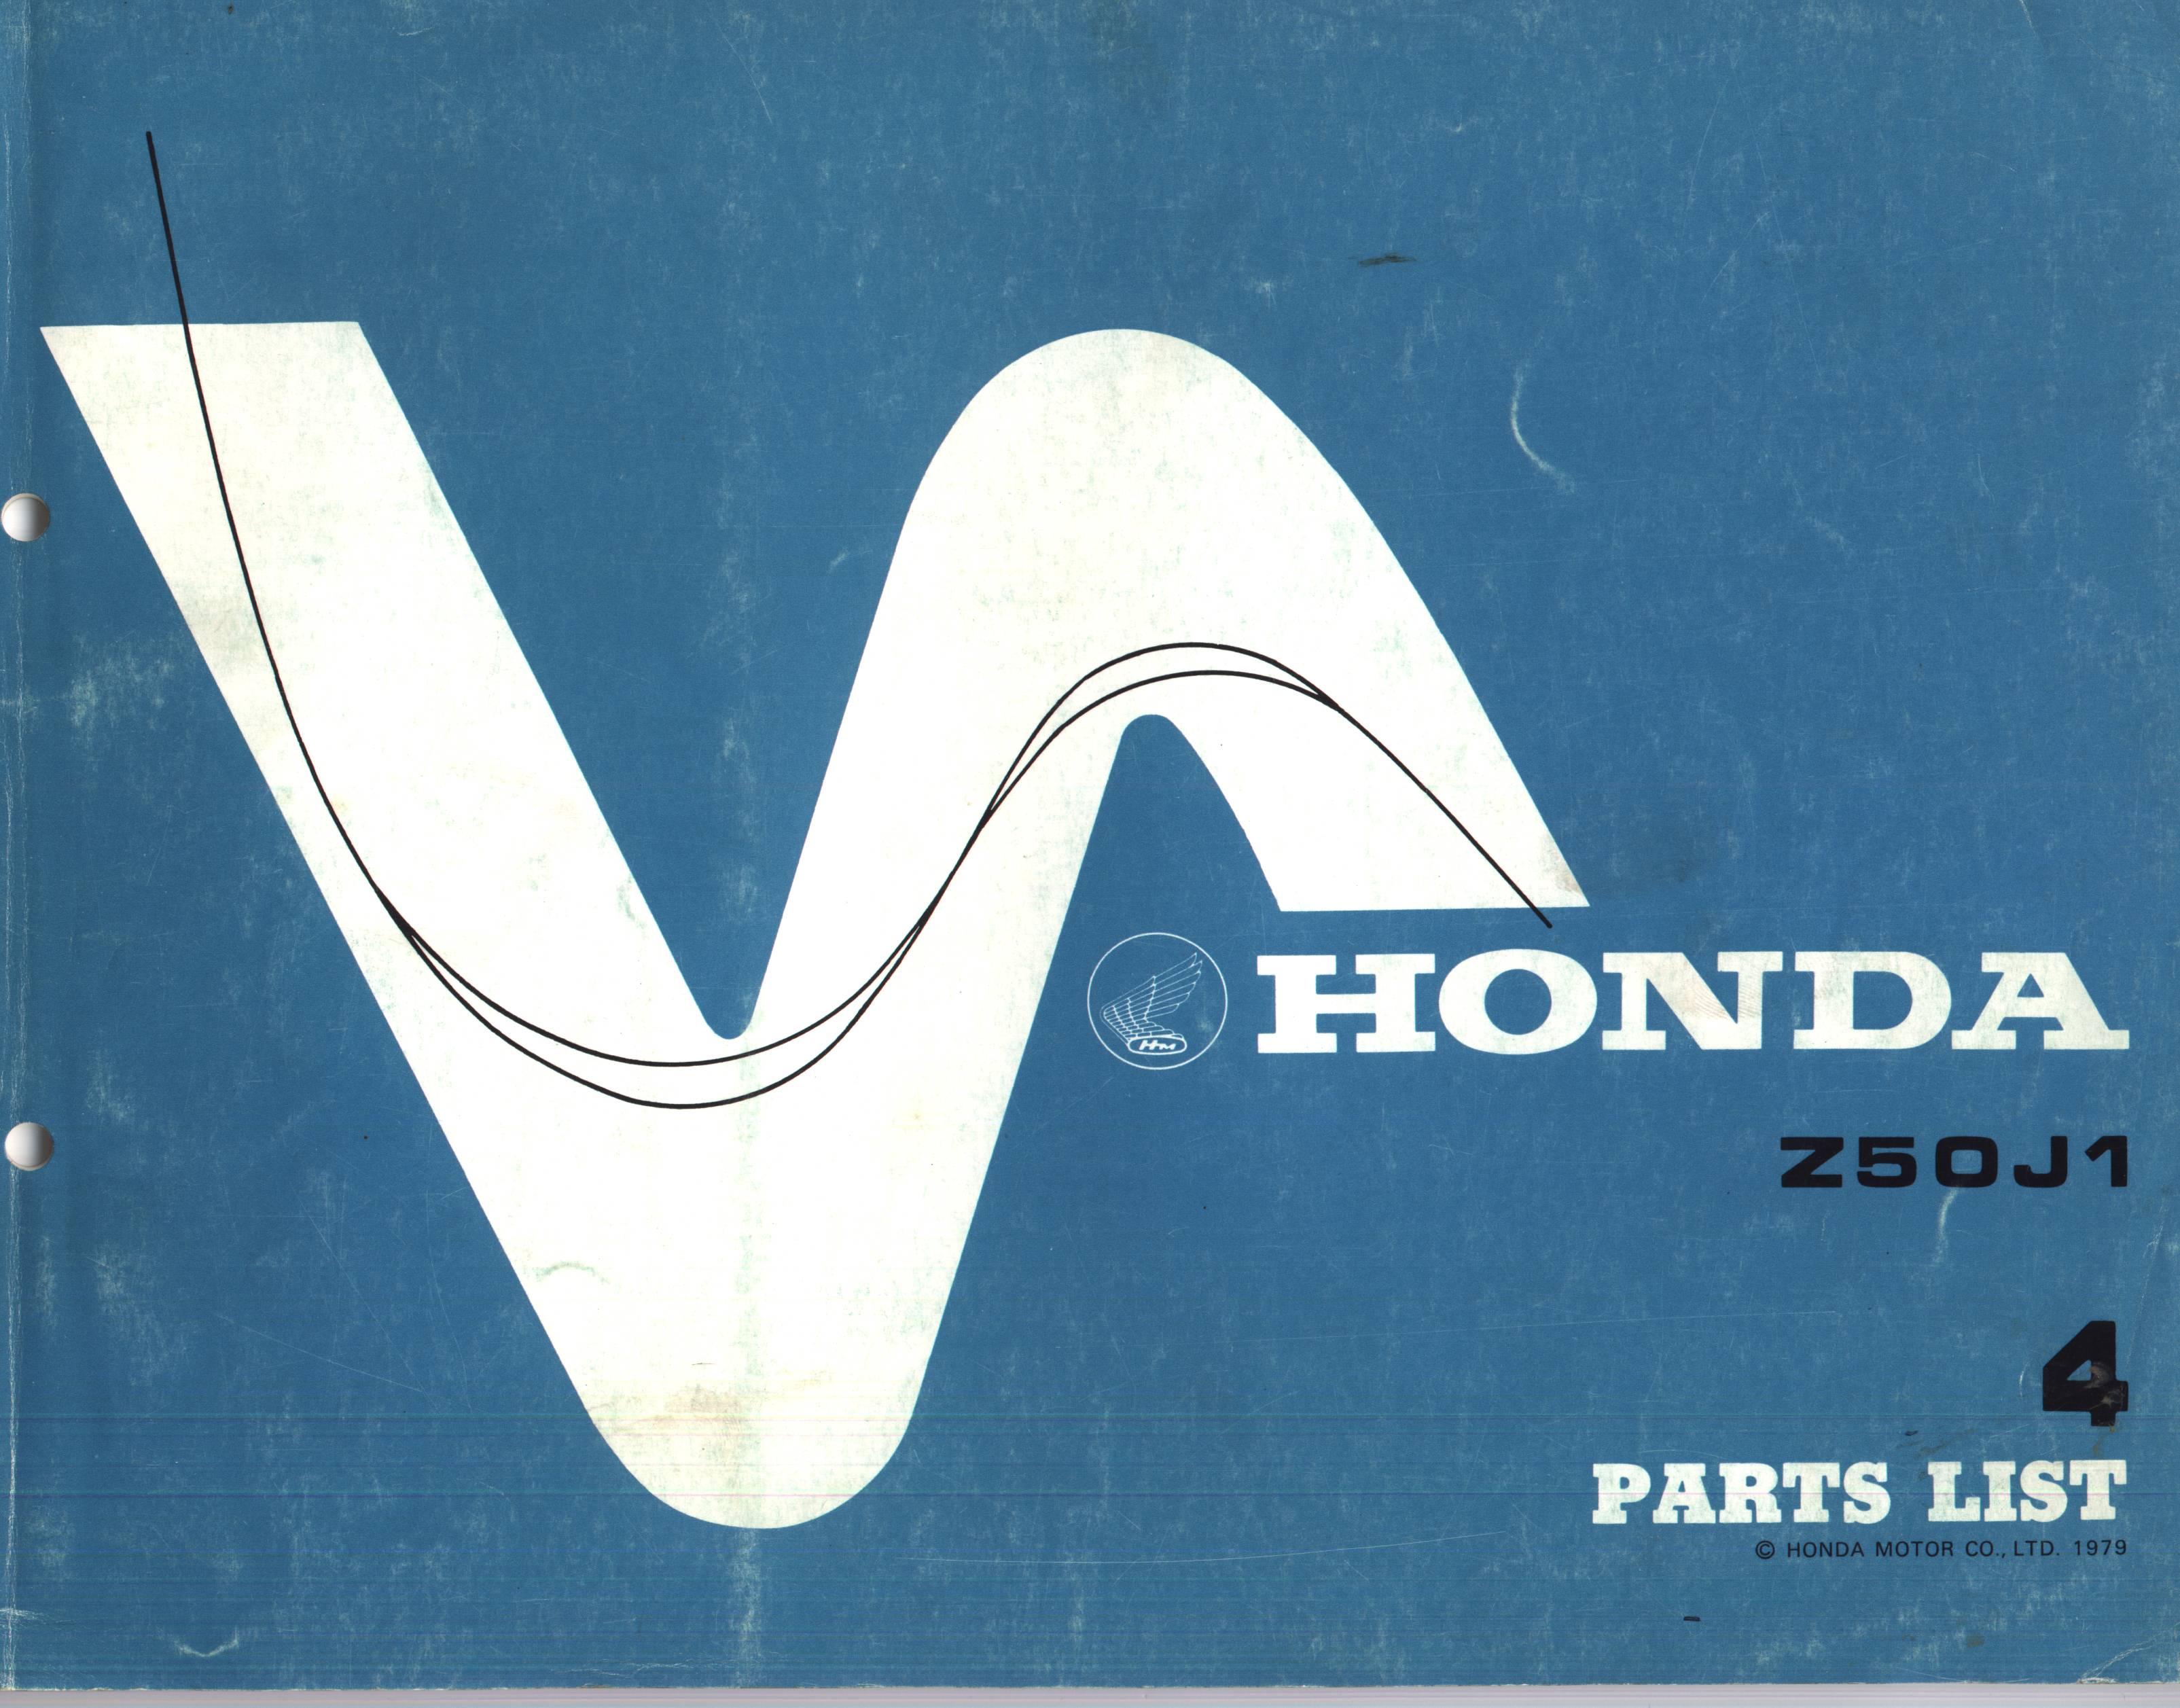 Parts List Honda Z50J1 (1979)